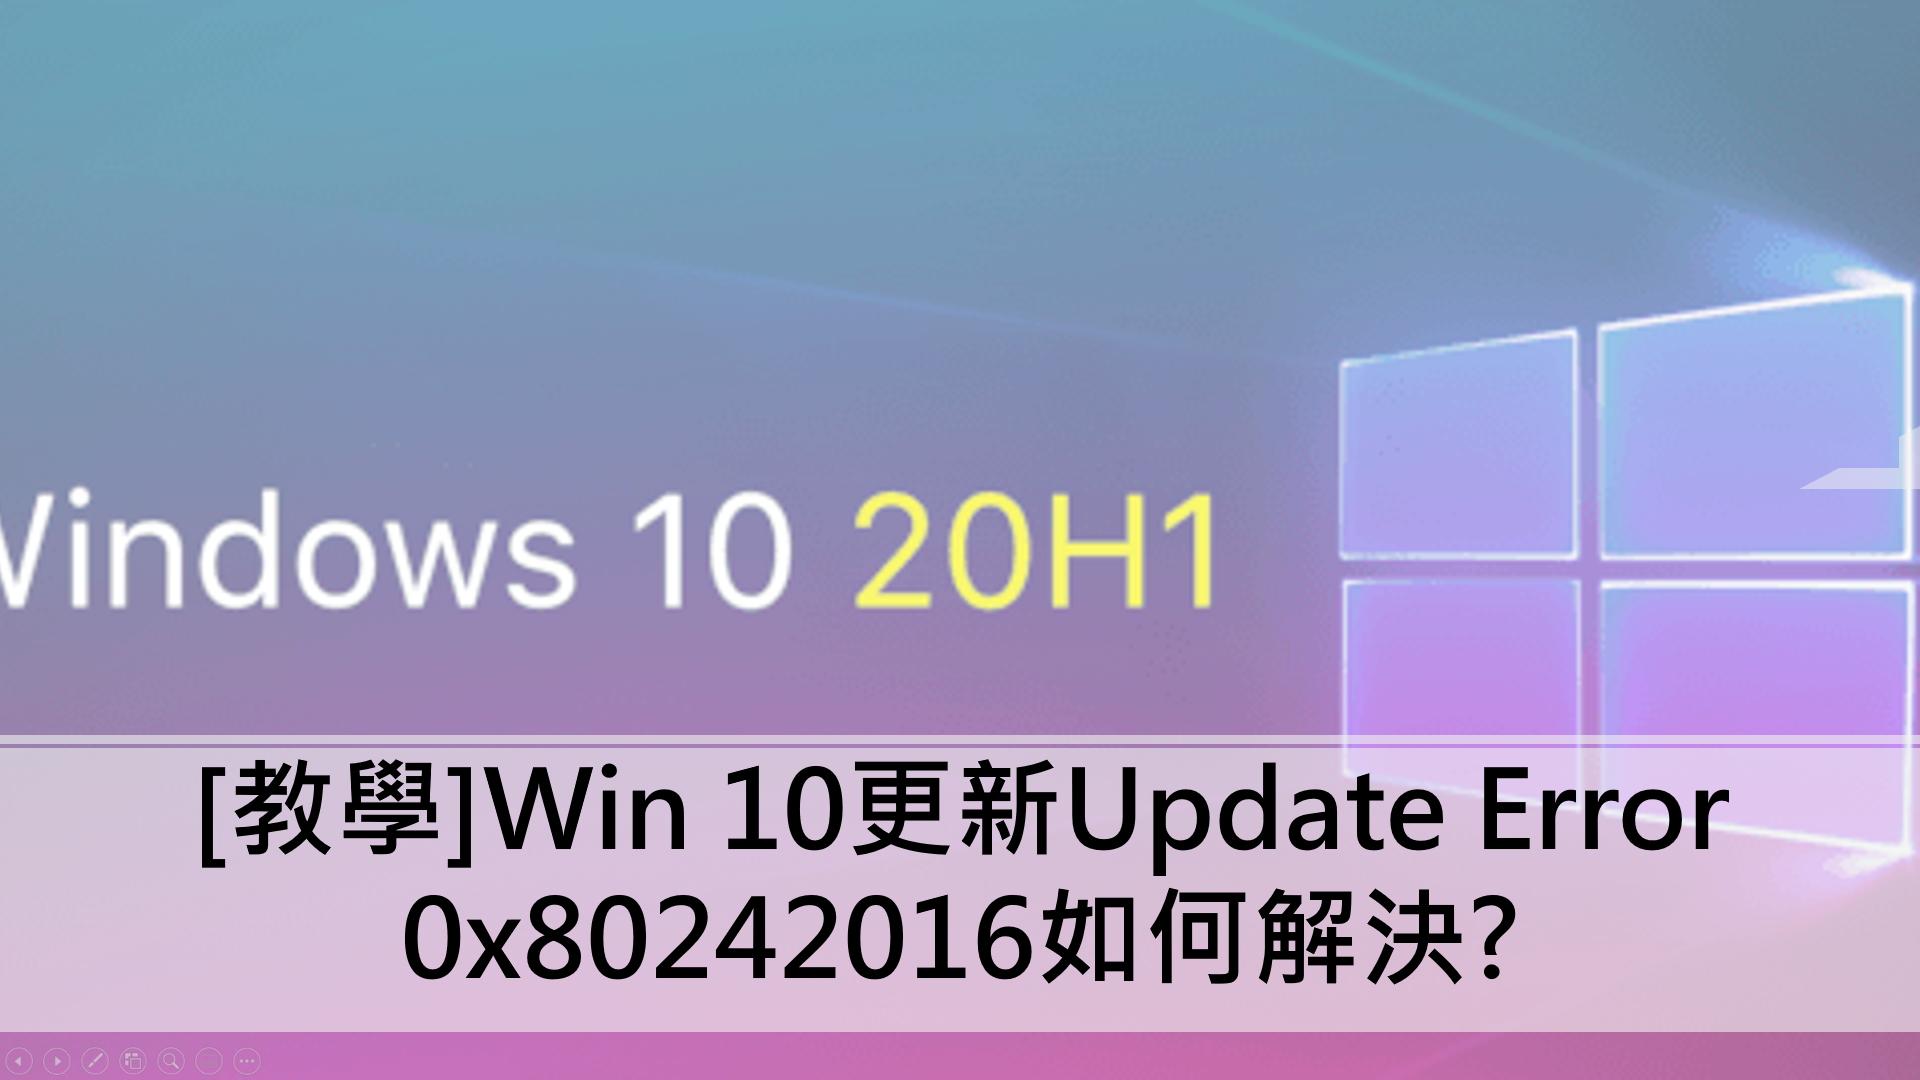 Win10 Update Error 0x80242016 Introduction